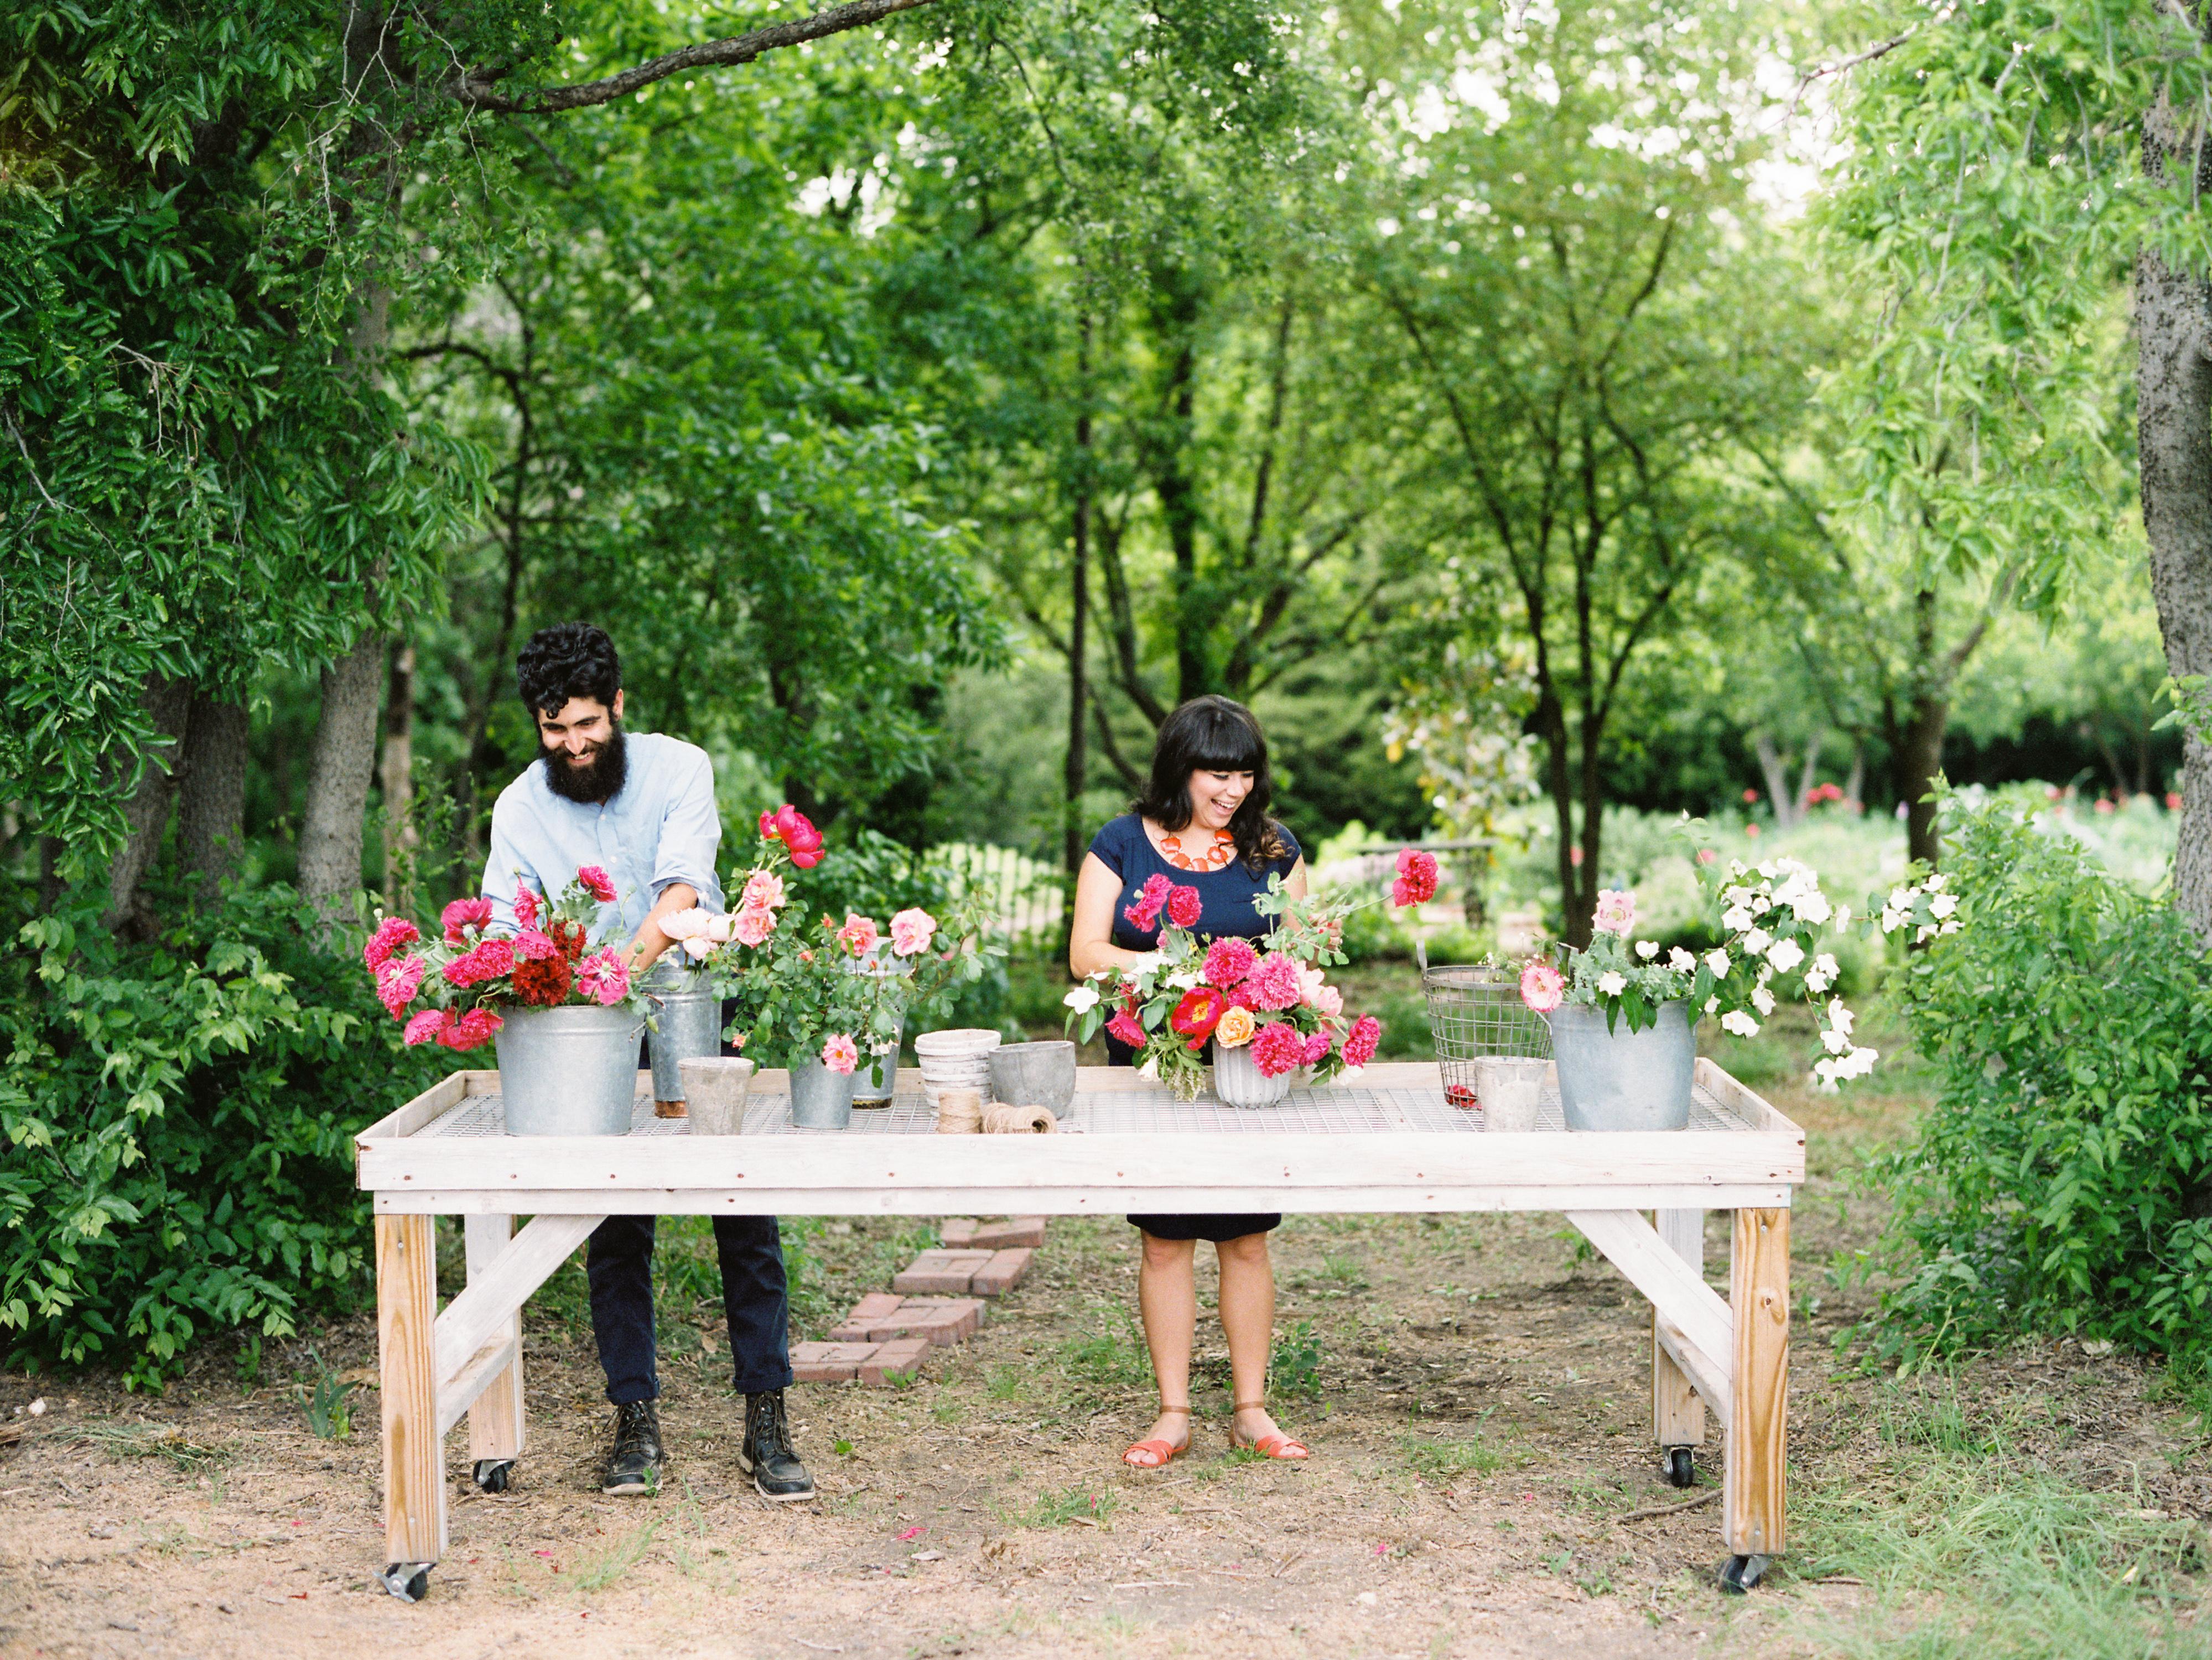 Debra Prinzing » Post » SLOW FLOWERS Podcast: The Fabulous